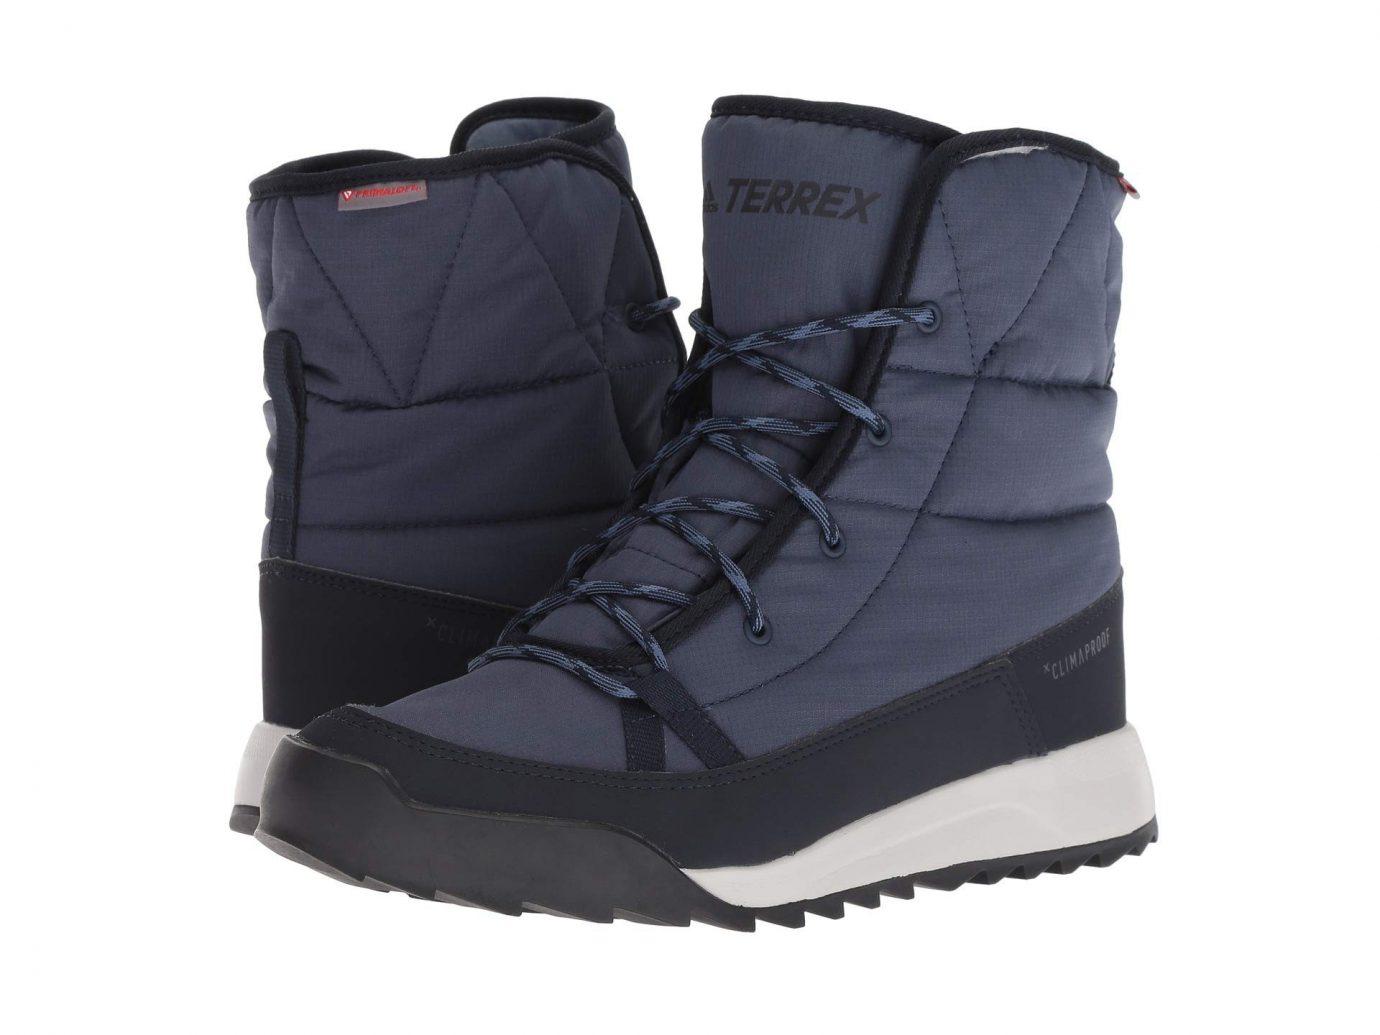 Adidas Terrex Choleah Padded Boots